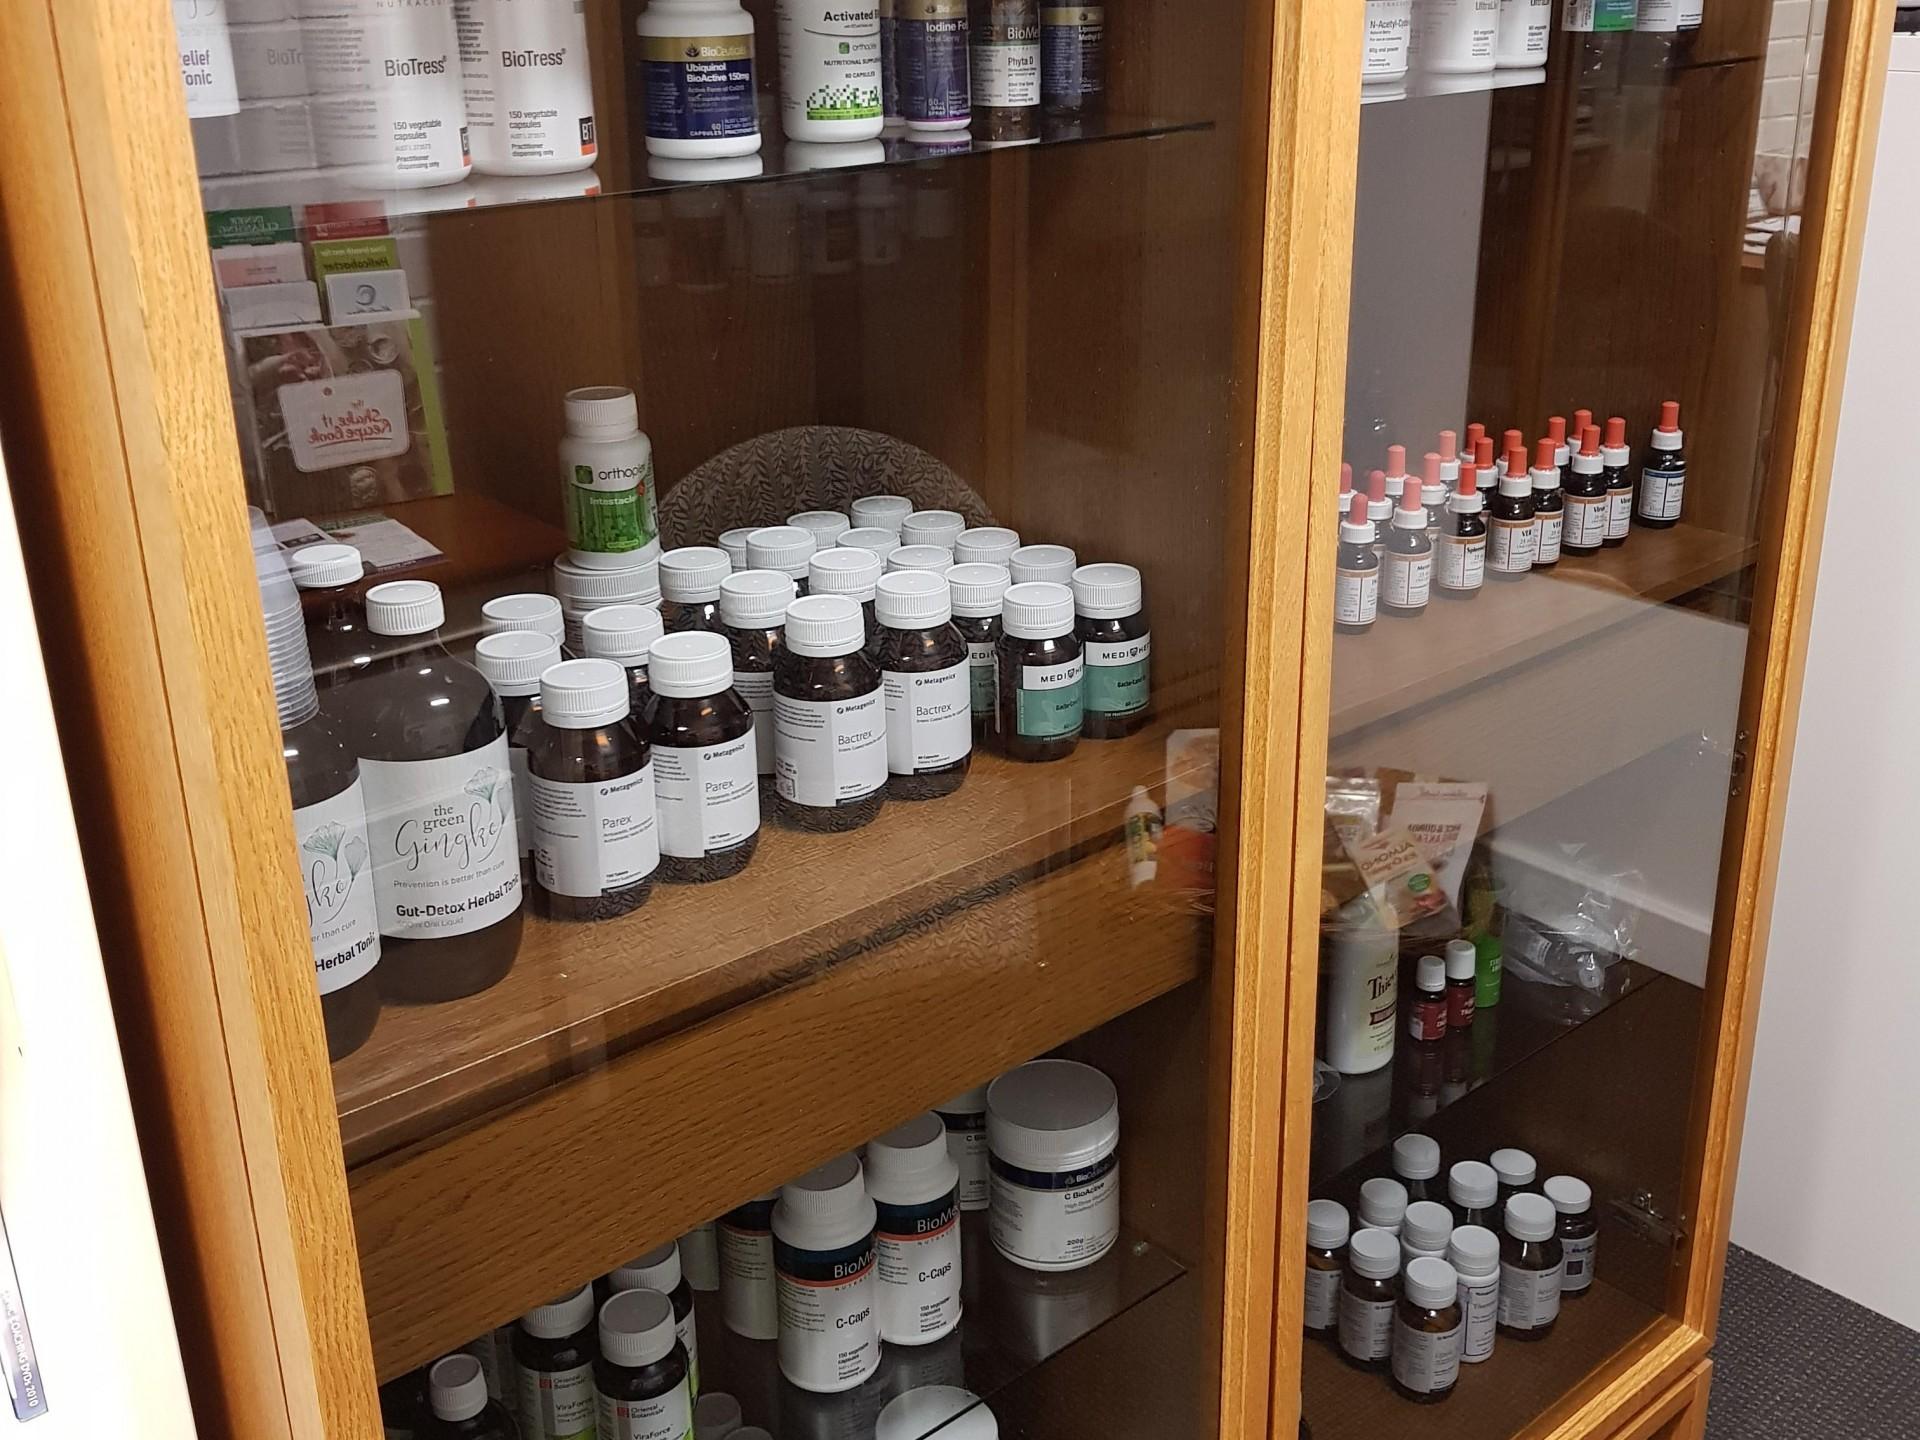 naturopathic-clinic-for-sale-98-000-plus-sav-abb-3